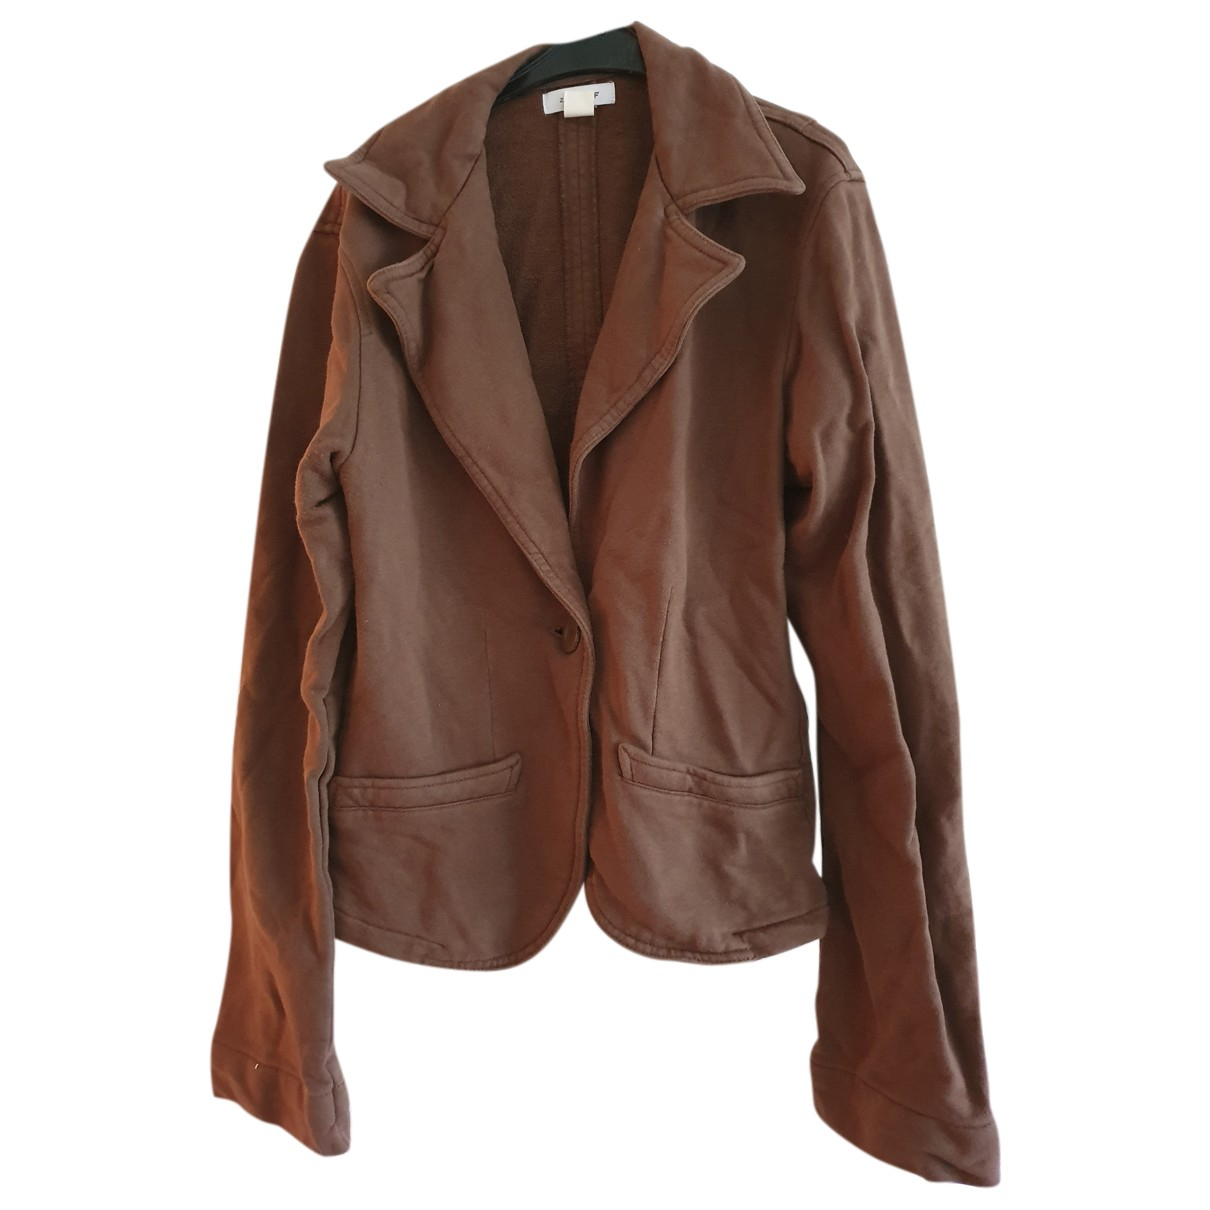 Zara - Veste   pour femme en coton - marron